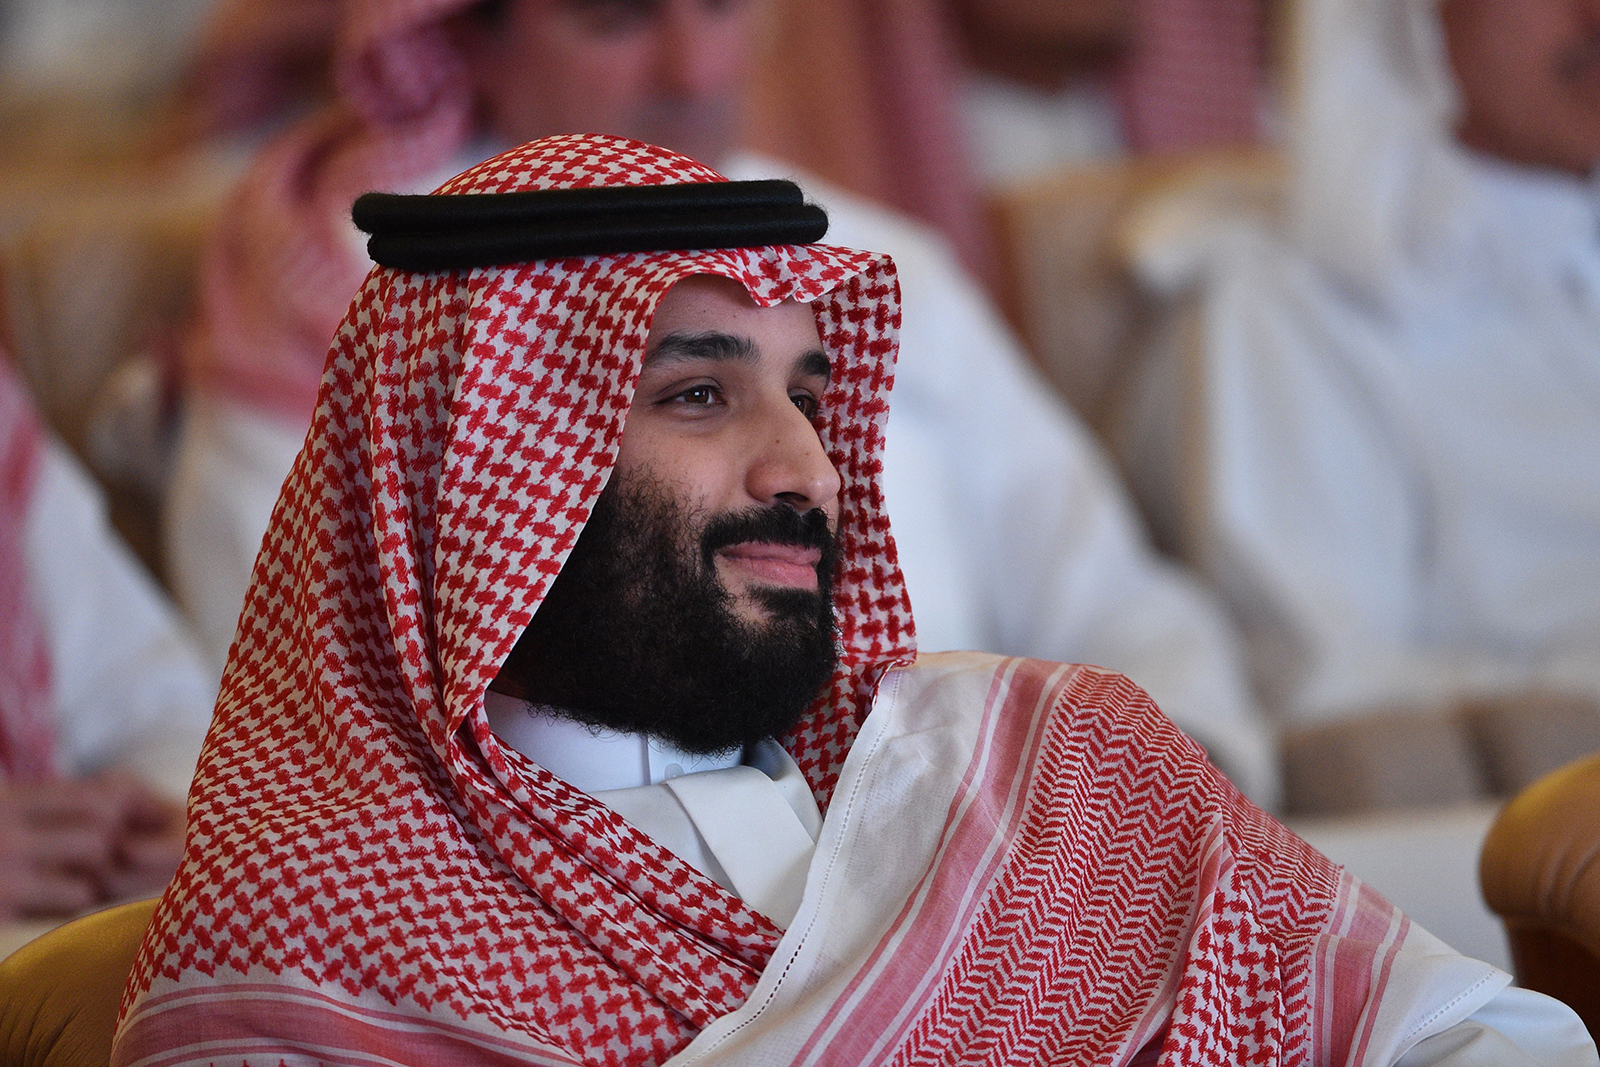 Reckless in Riyadh